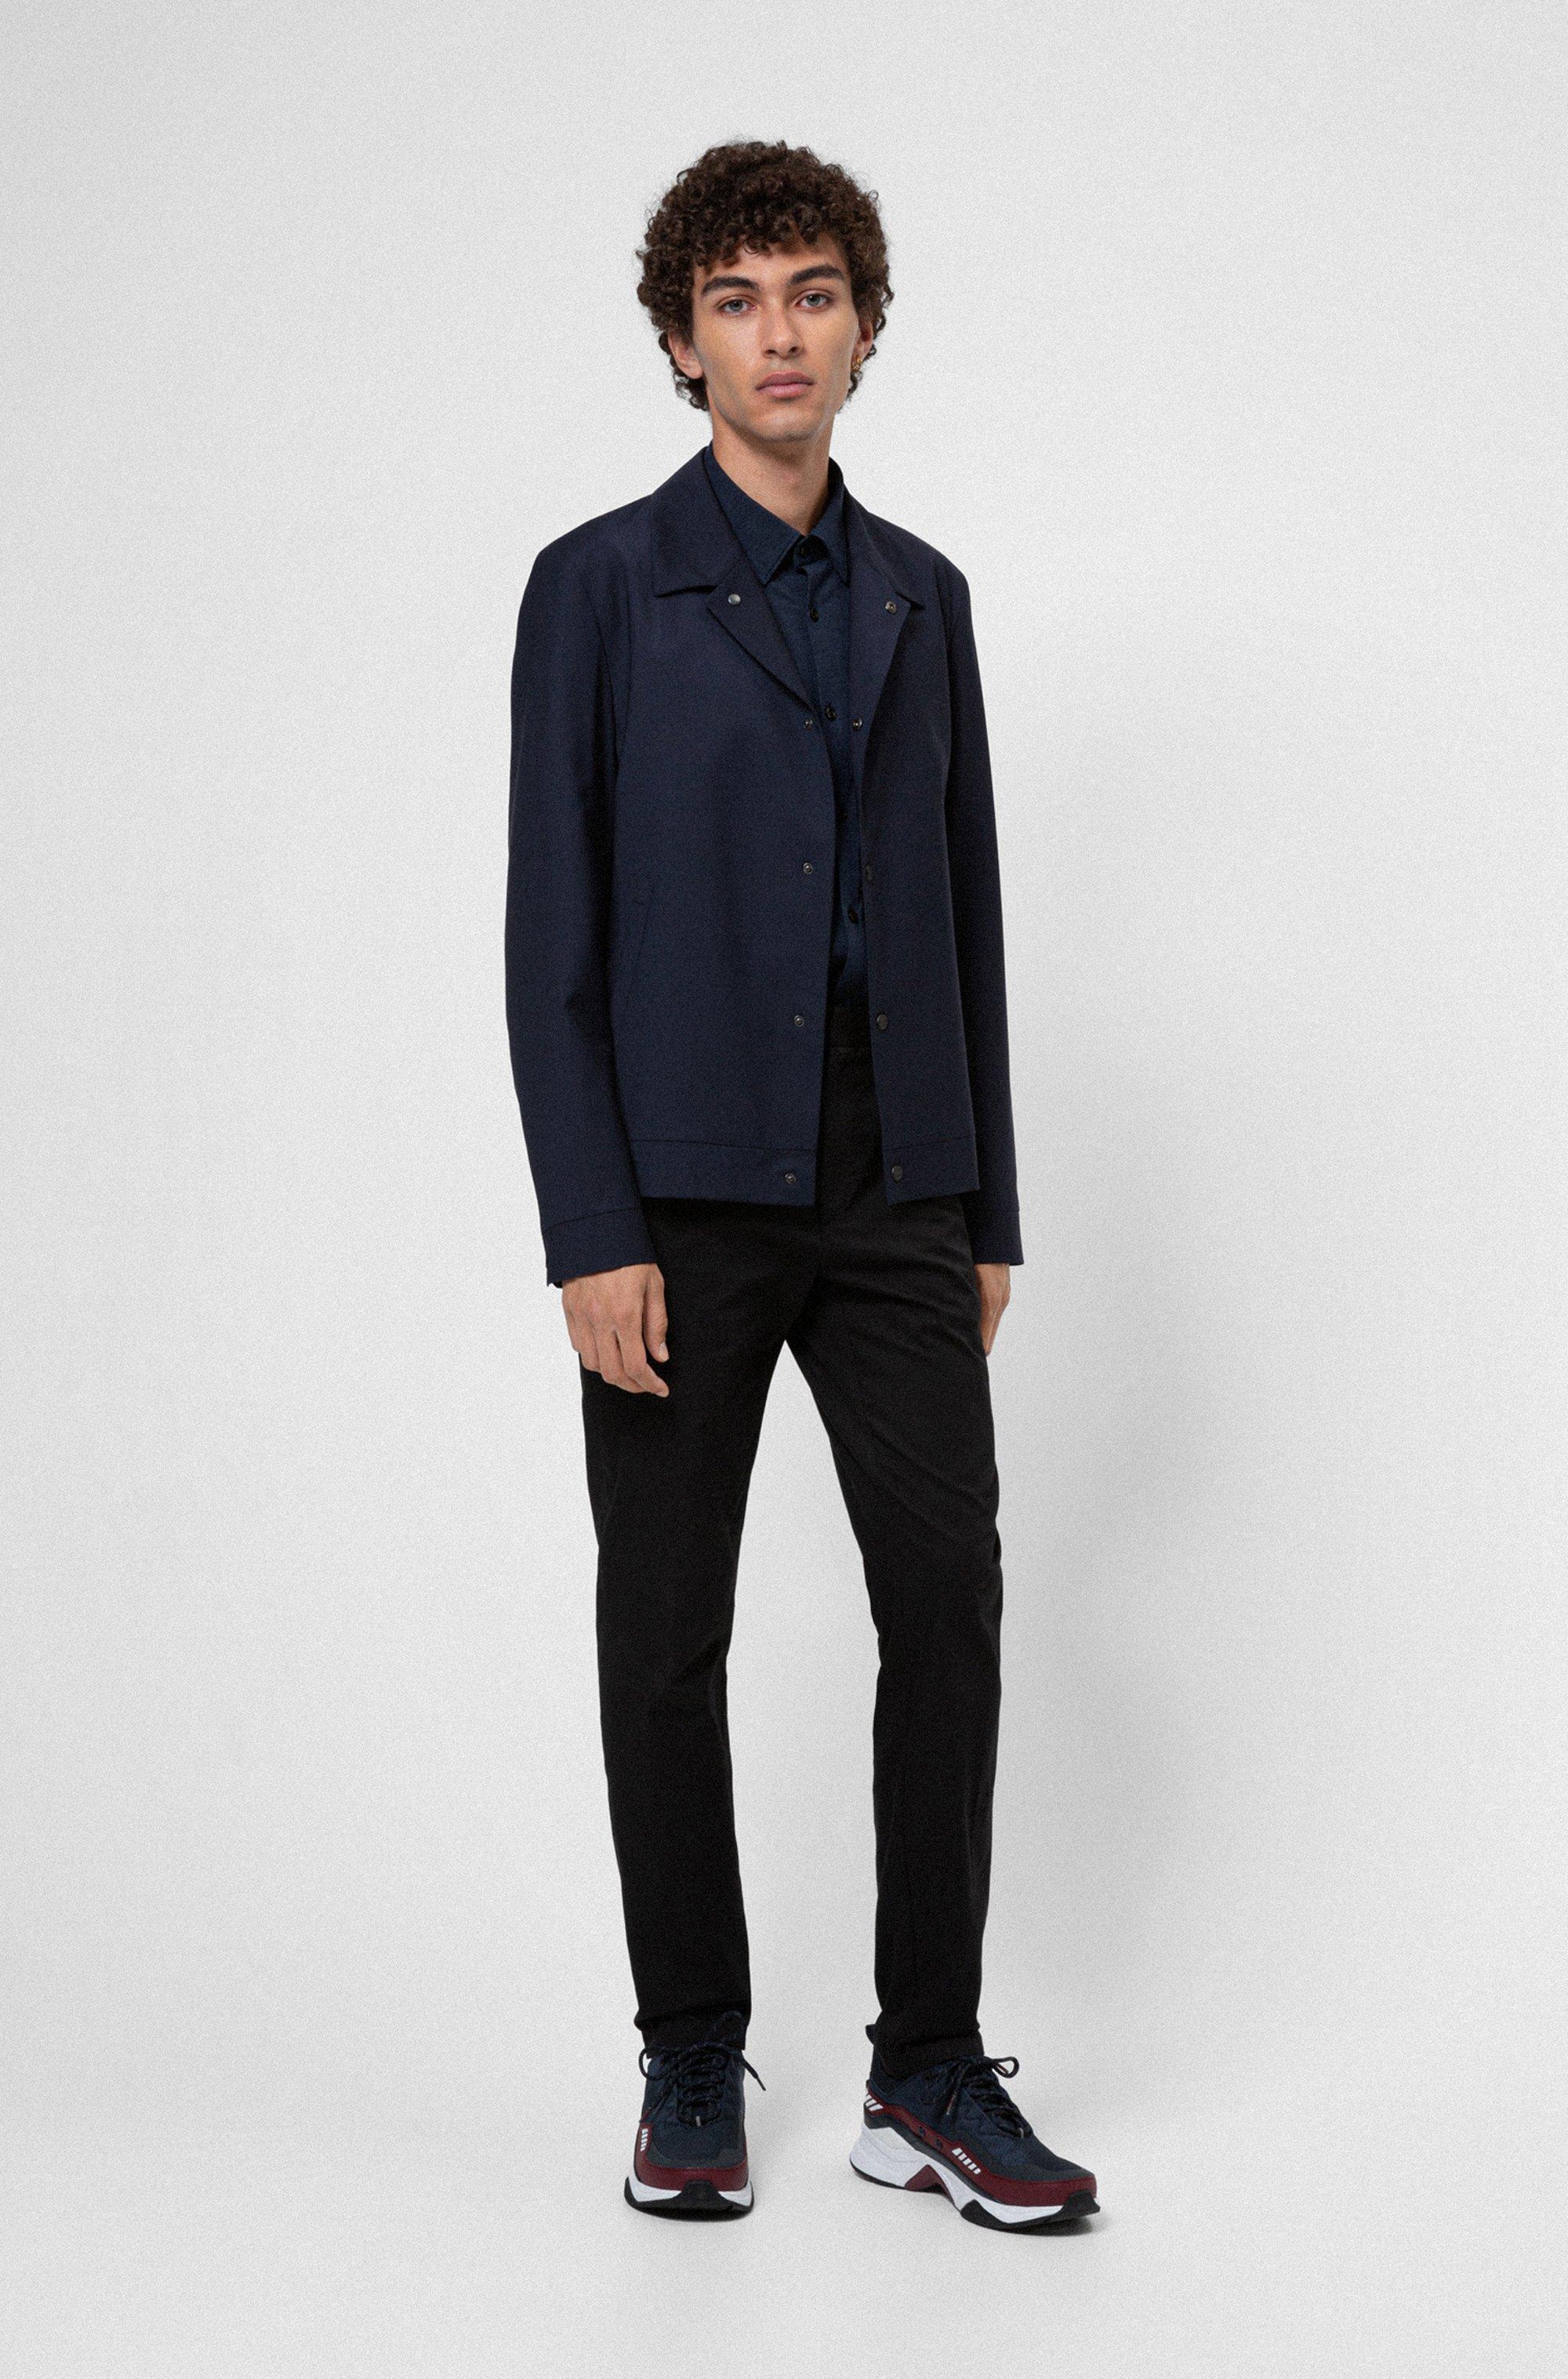 Wool-blend slim-fit jacket with press studs